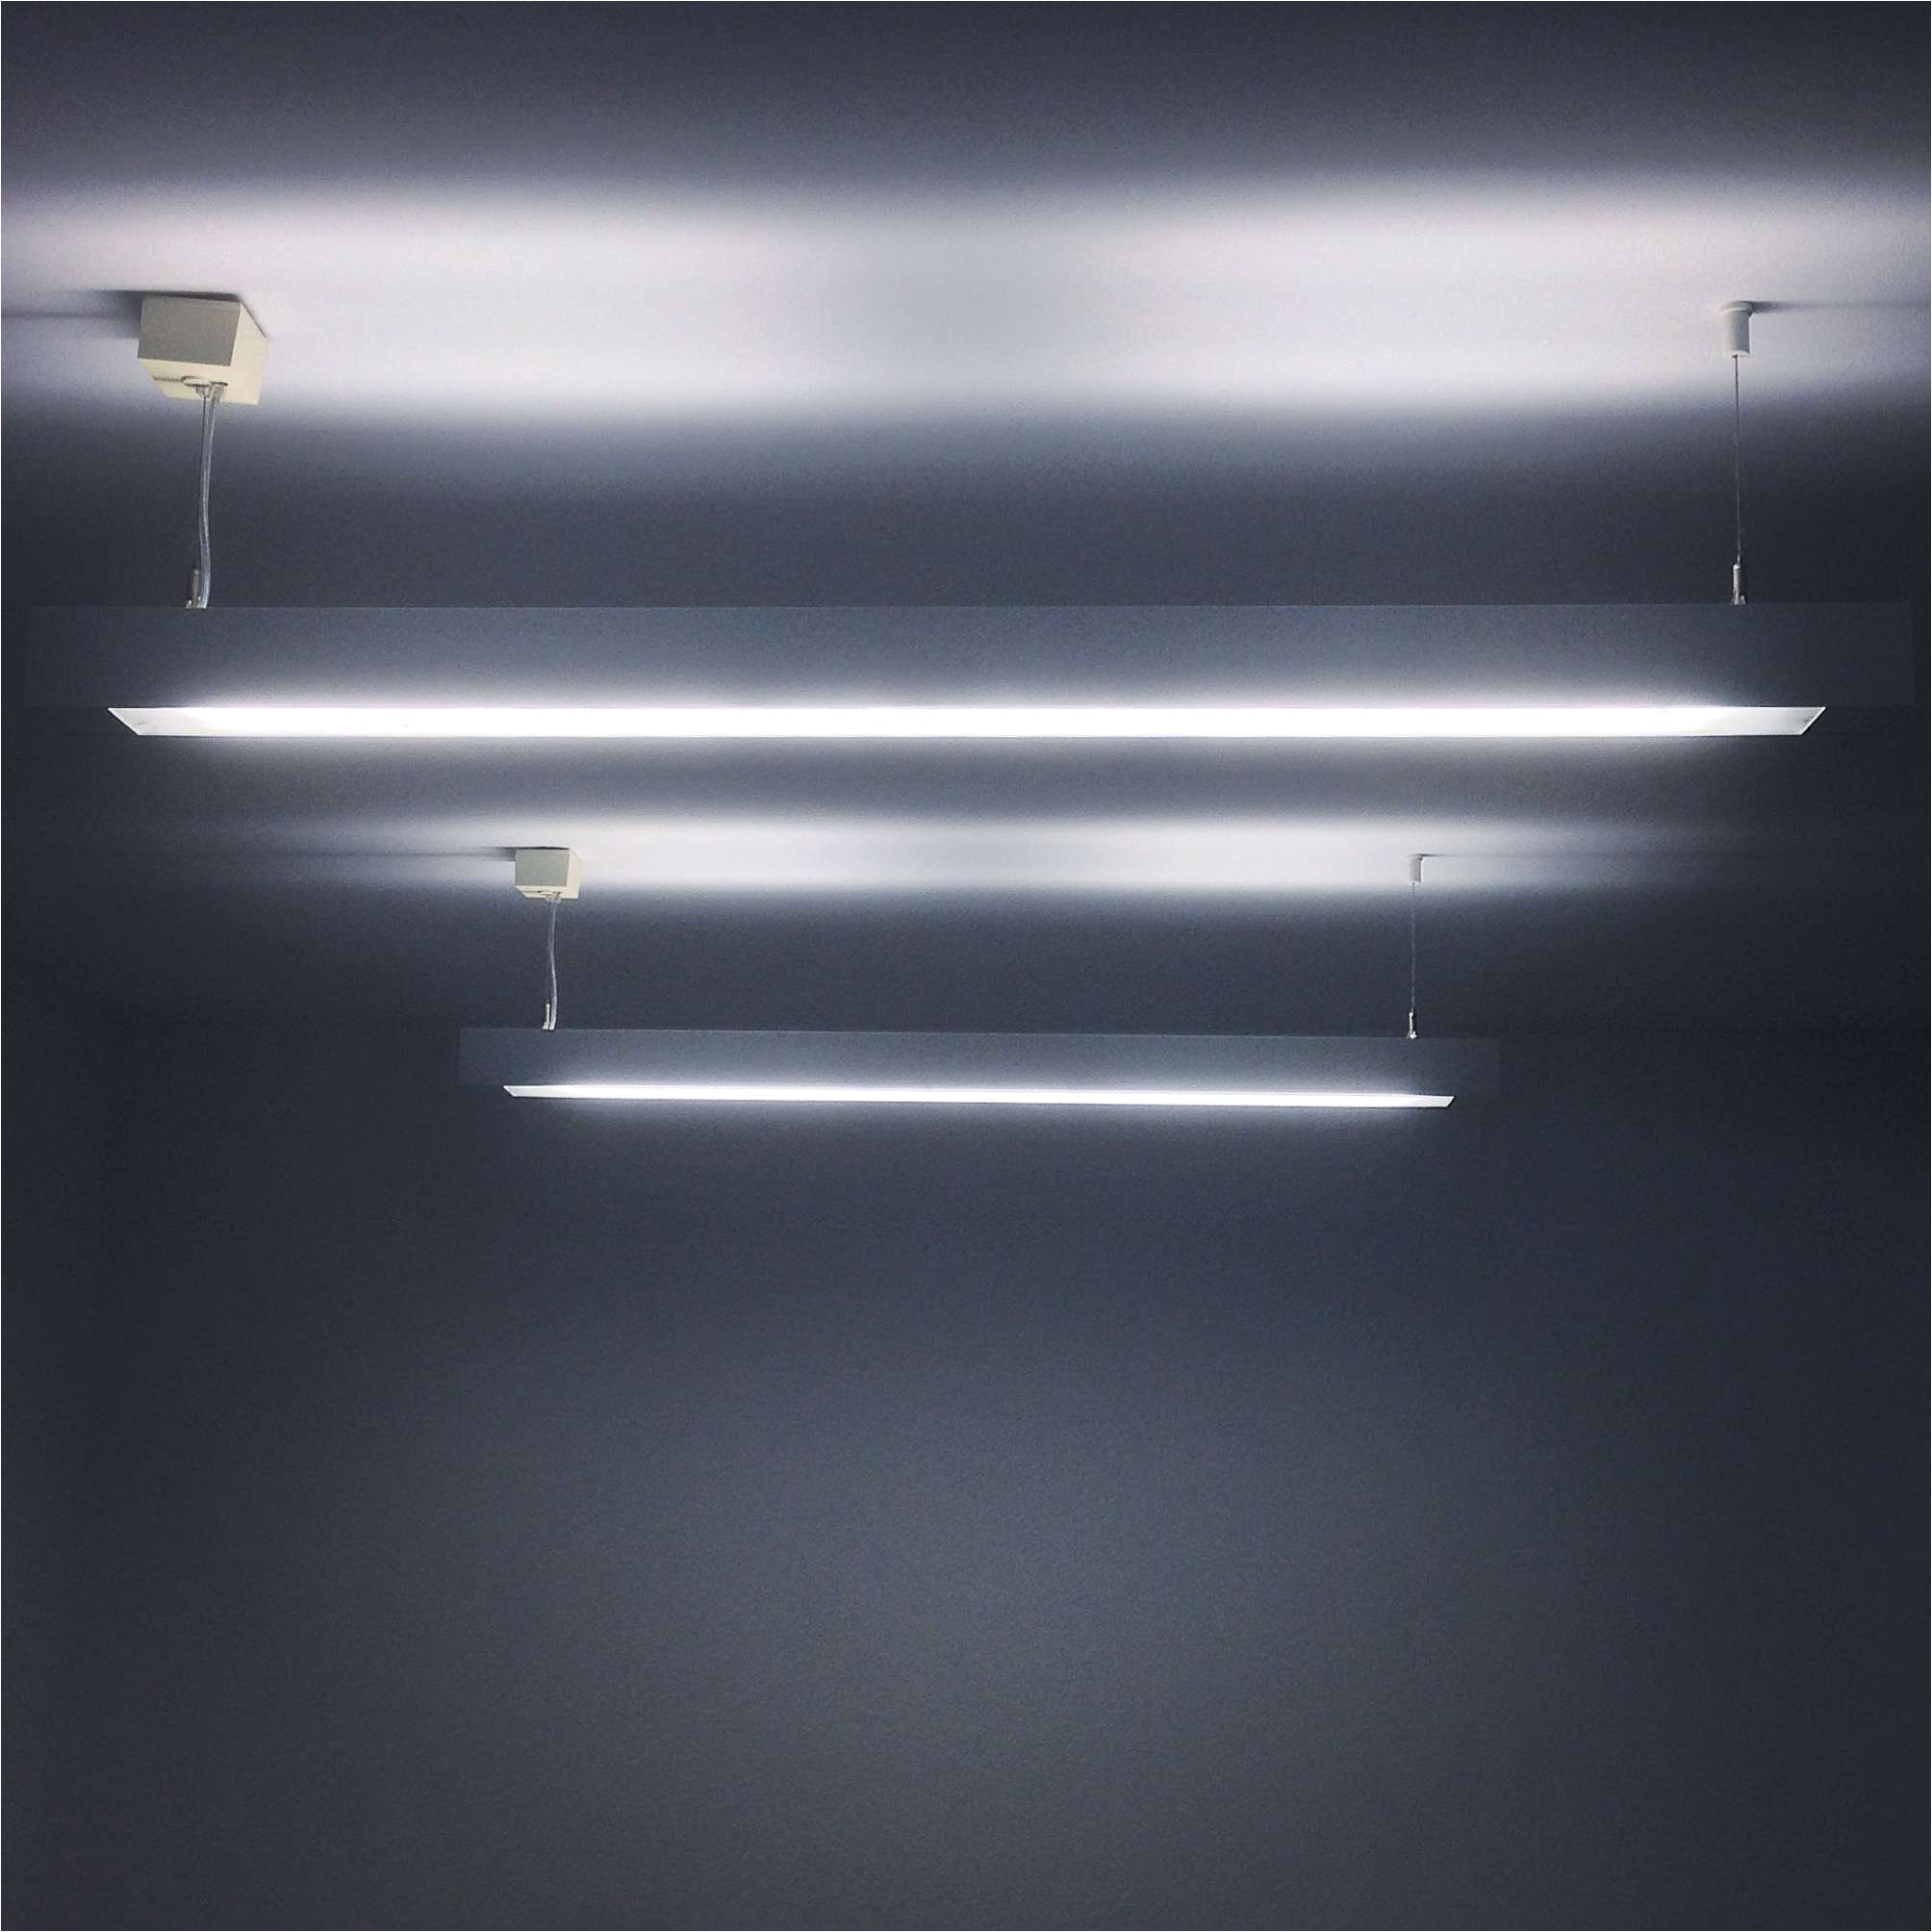 fluorescentlights gettyimages 565824809 5a00a4a69802070037bd3501